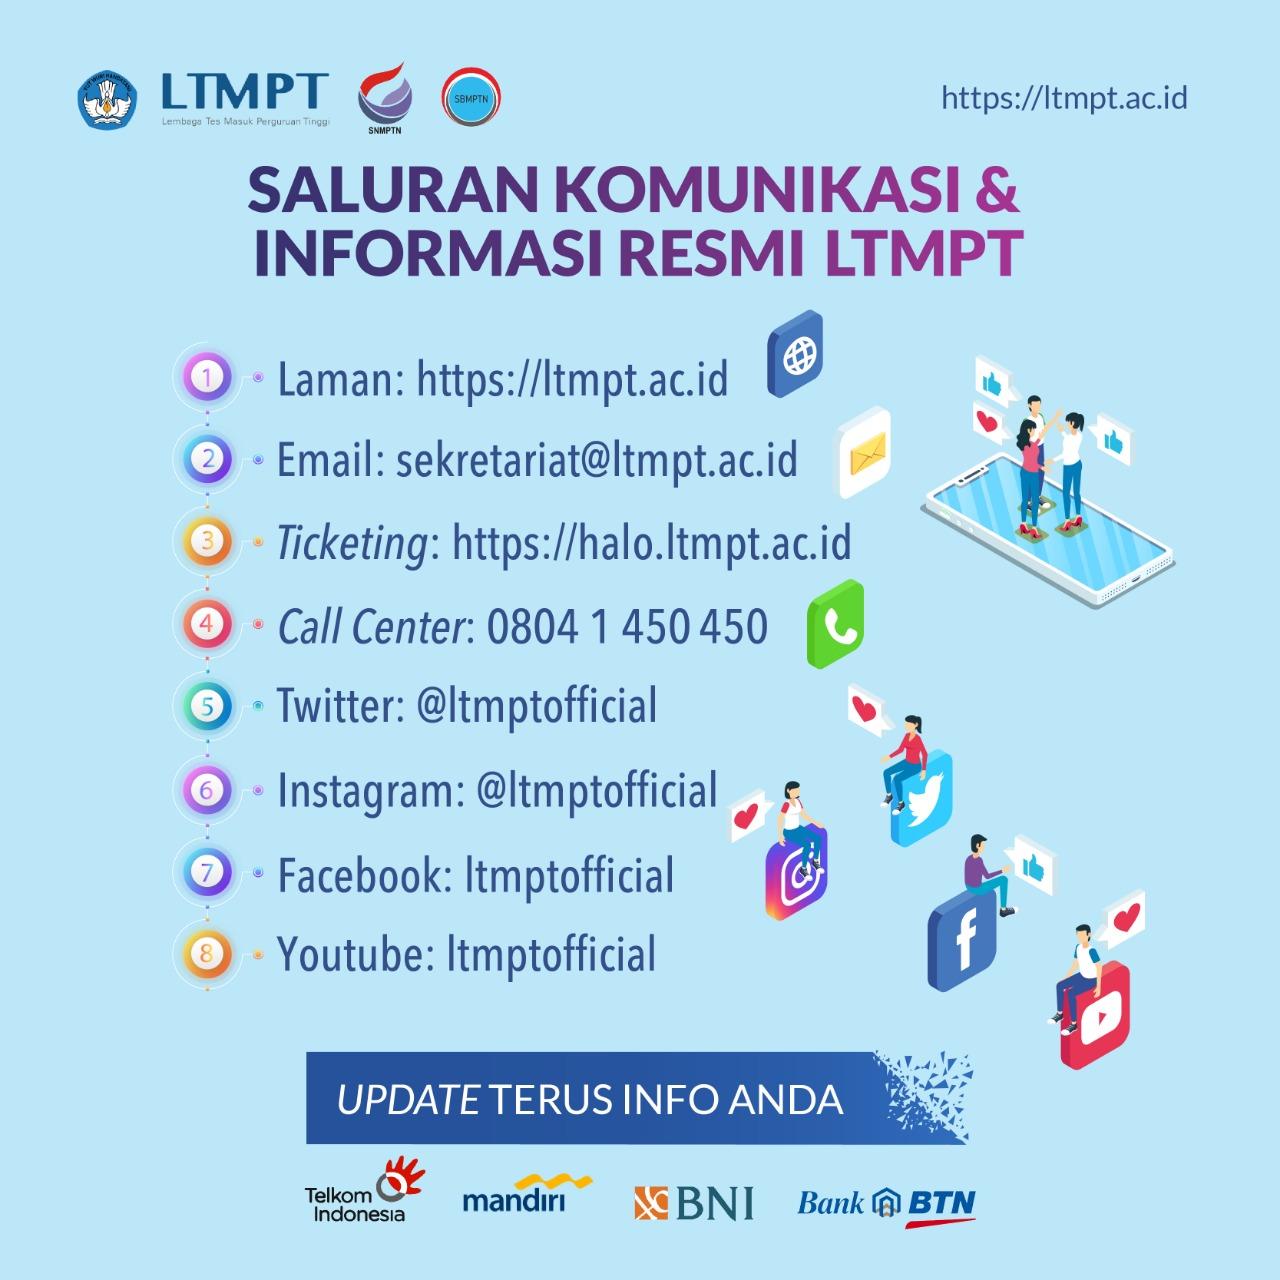 http://news.unimal.ac.id/index/single/1037/unimal-masuk-tiga-besar-penerima-mahasiswa-snmptn-2020